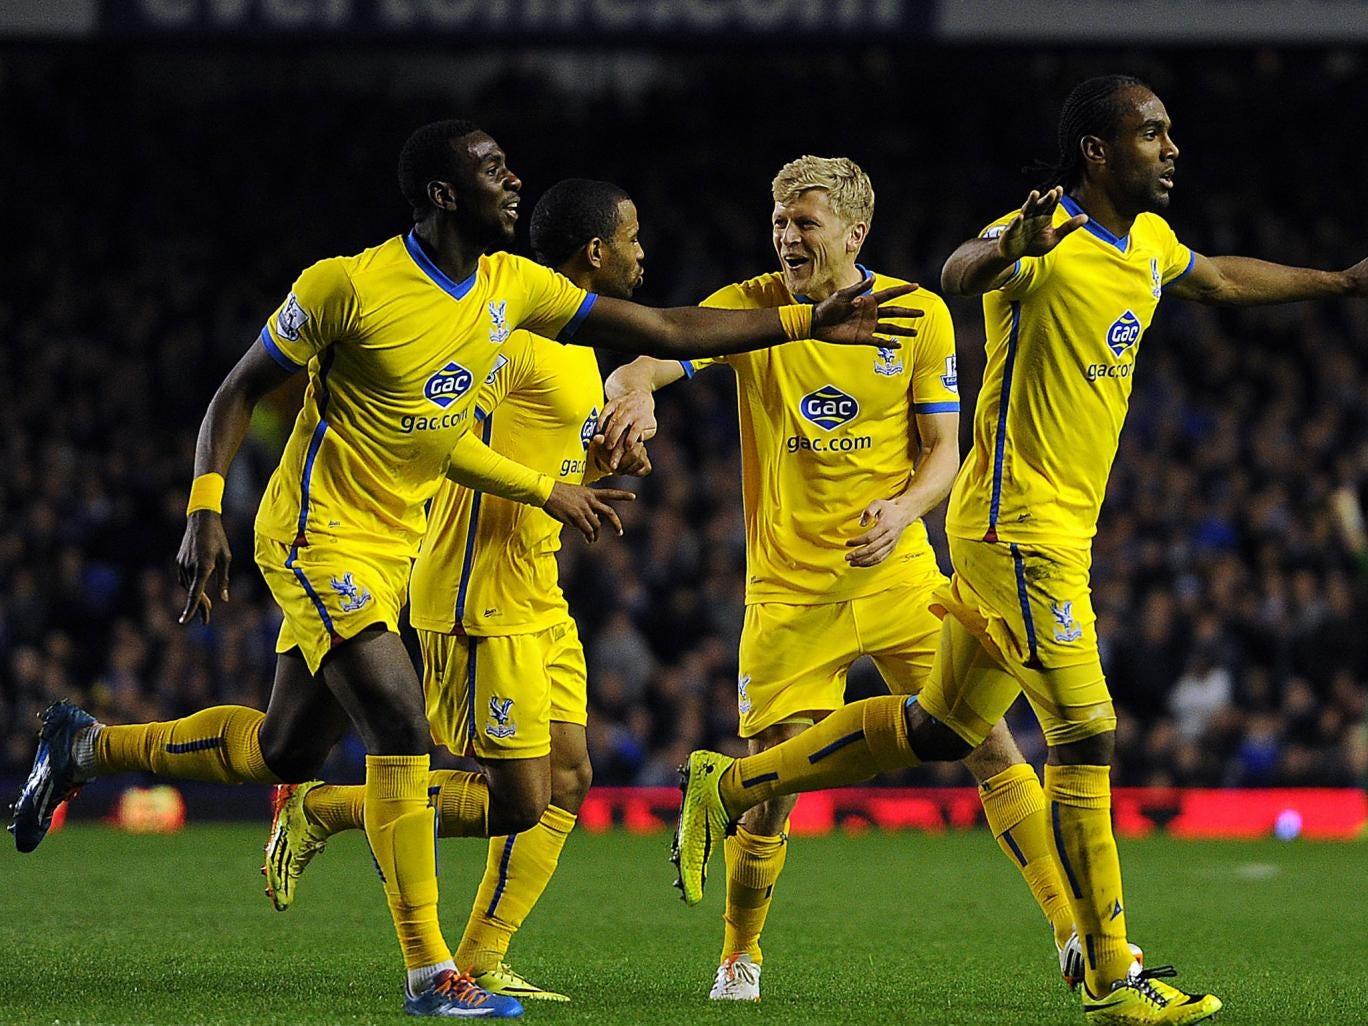 Cameron Jerome (far right) celebrates scoring Palace's third goal against Everton on Wednesday